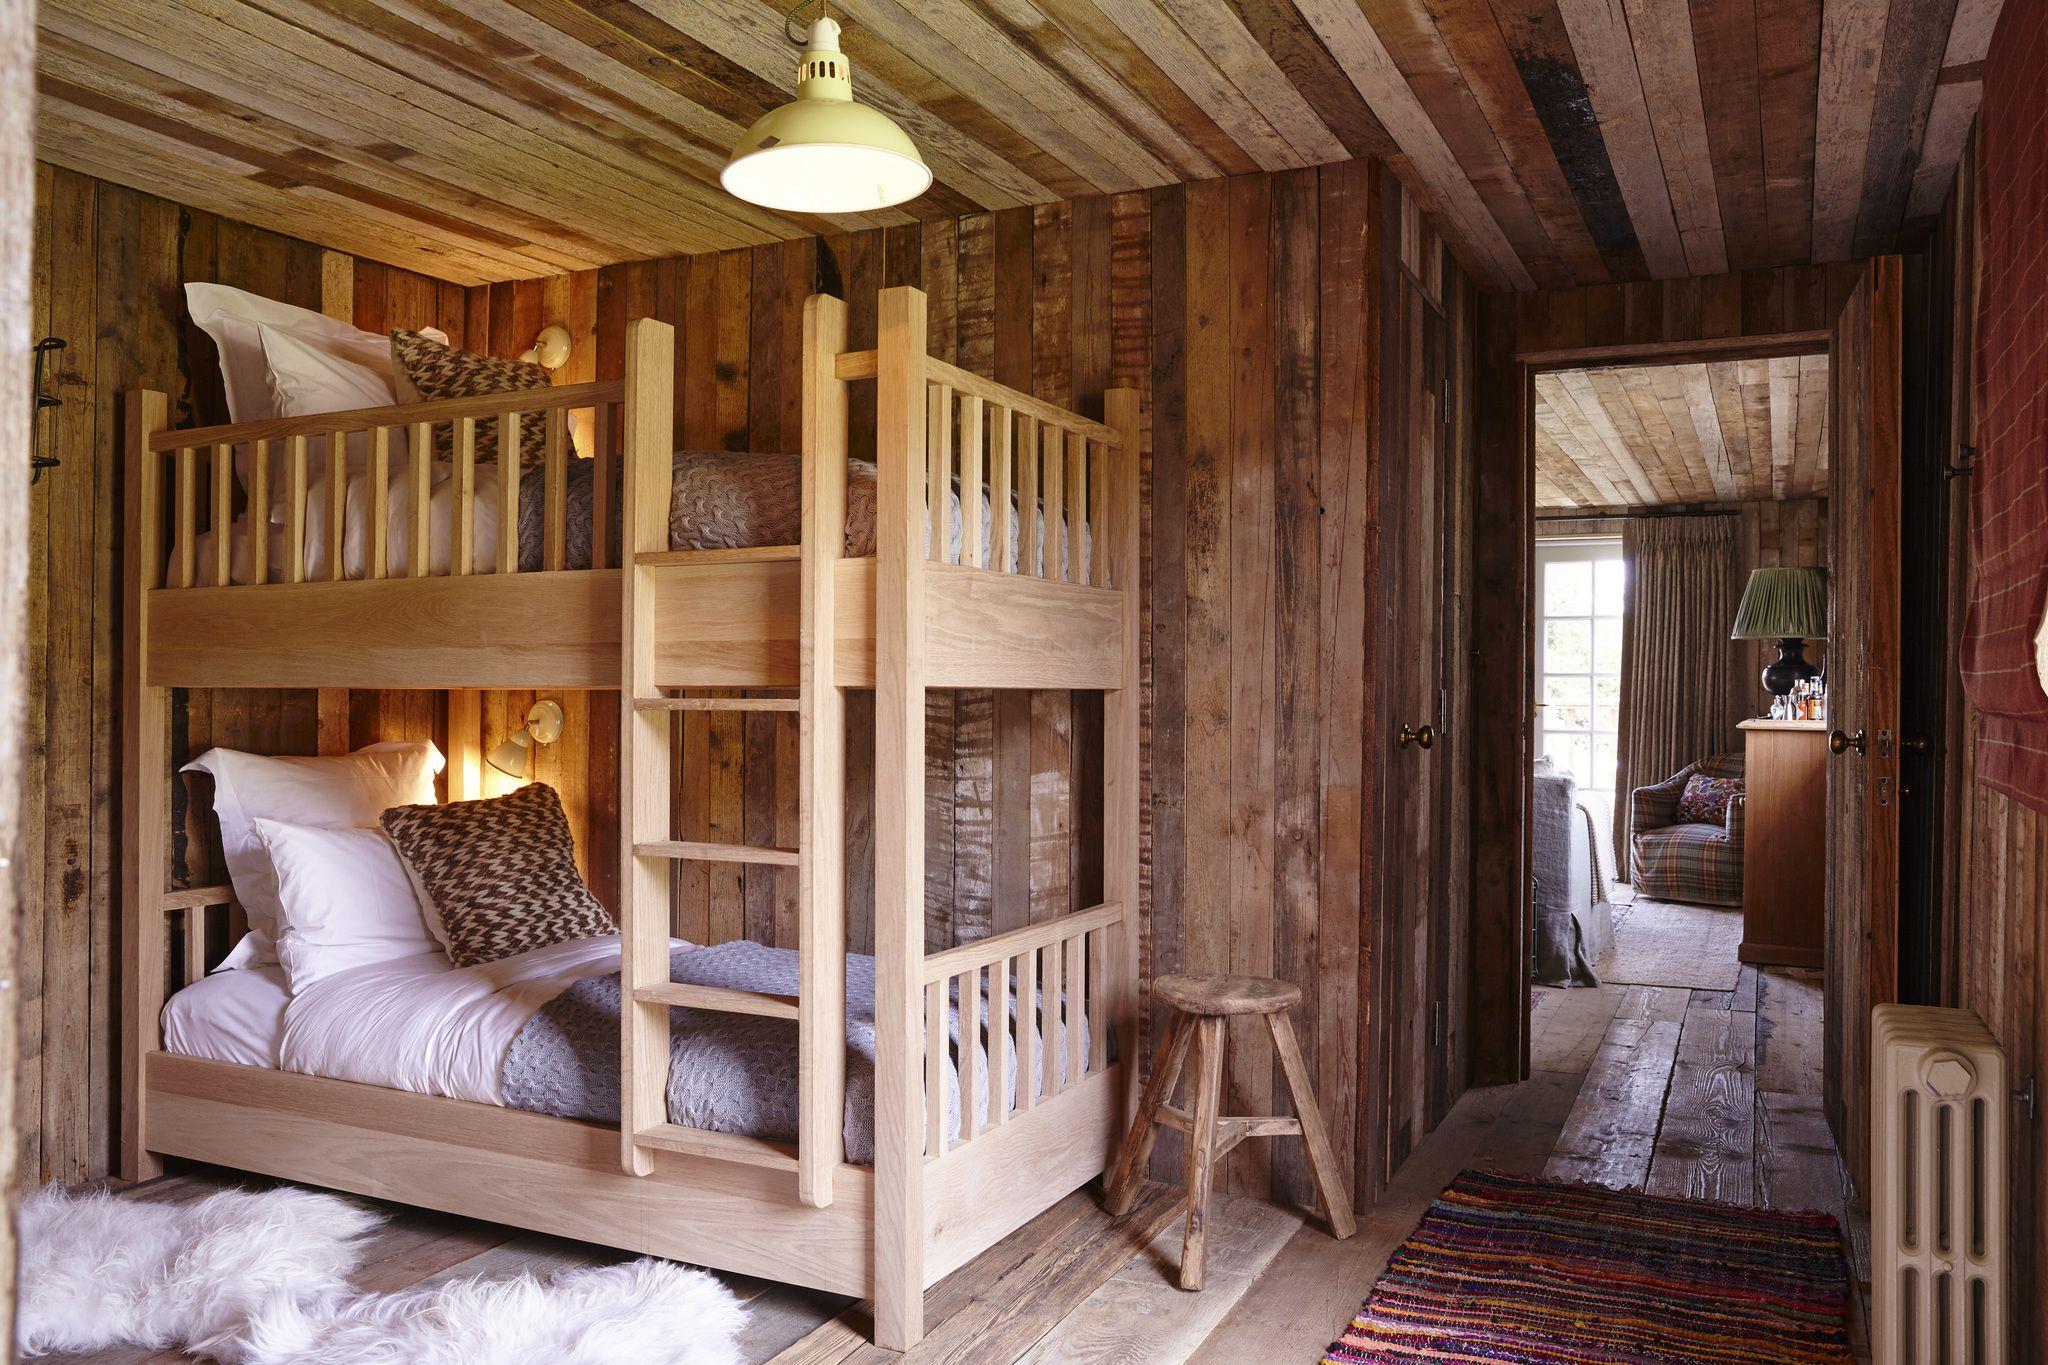 Copyright_soho_farm_house_cabin_1.5bed_5 | Ireland life | Pinterest